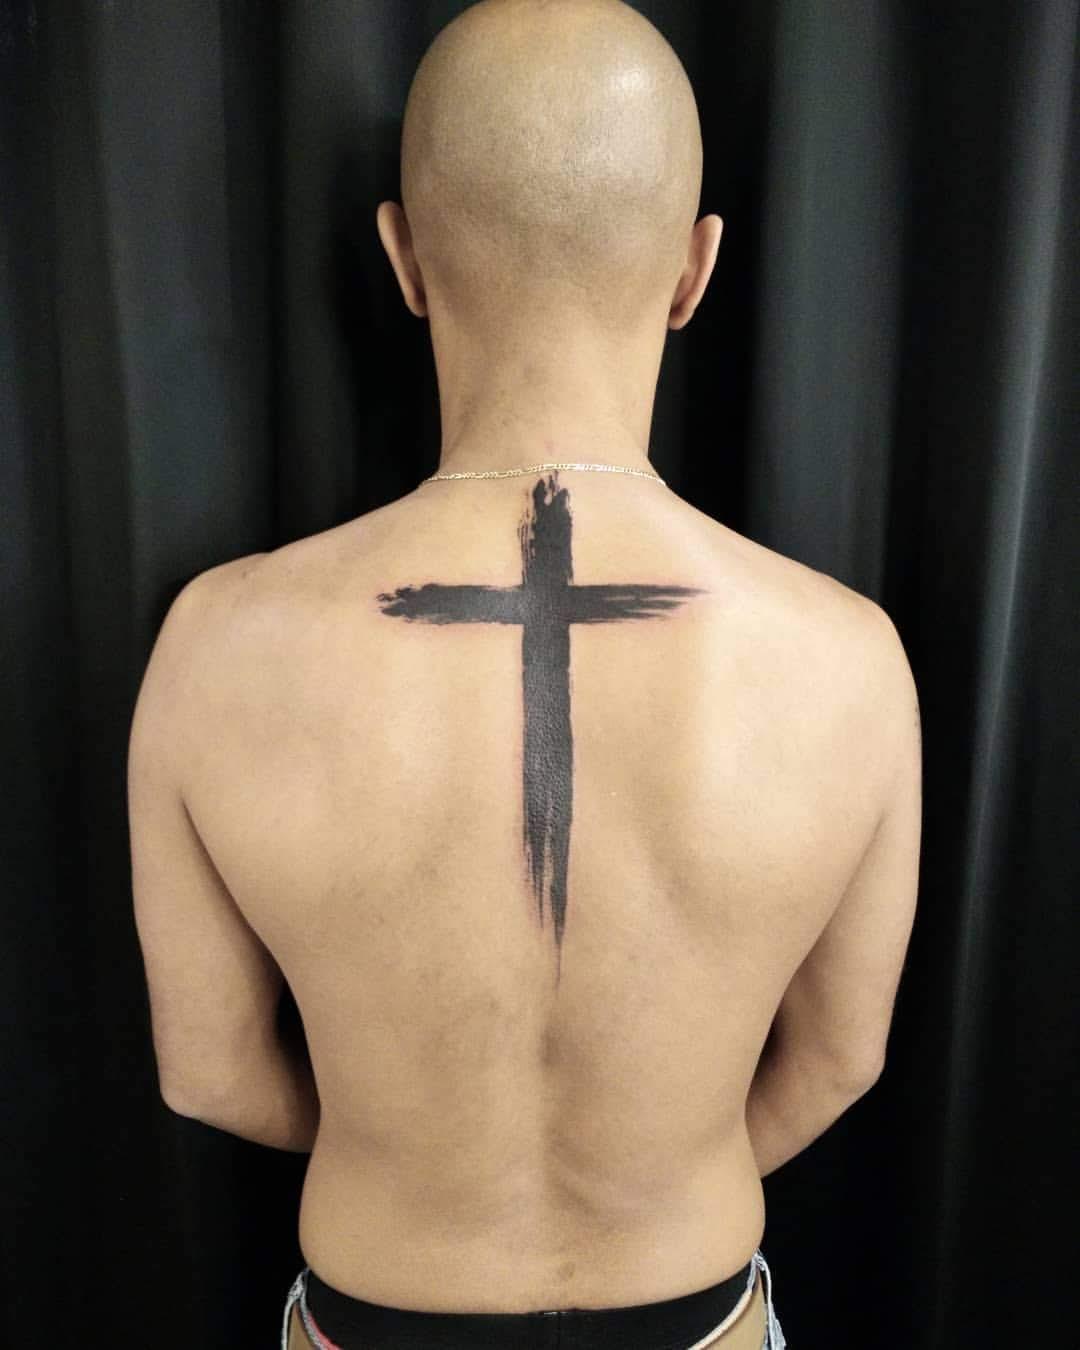 Solid Cross Tattoos : solid, cross, tattoos, Cross, Tattoo, Designs, Chronic